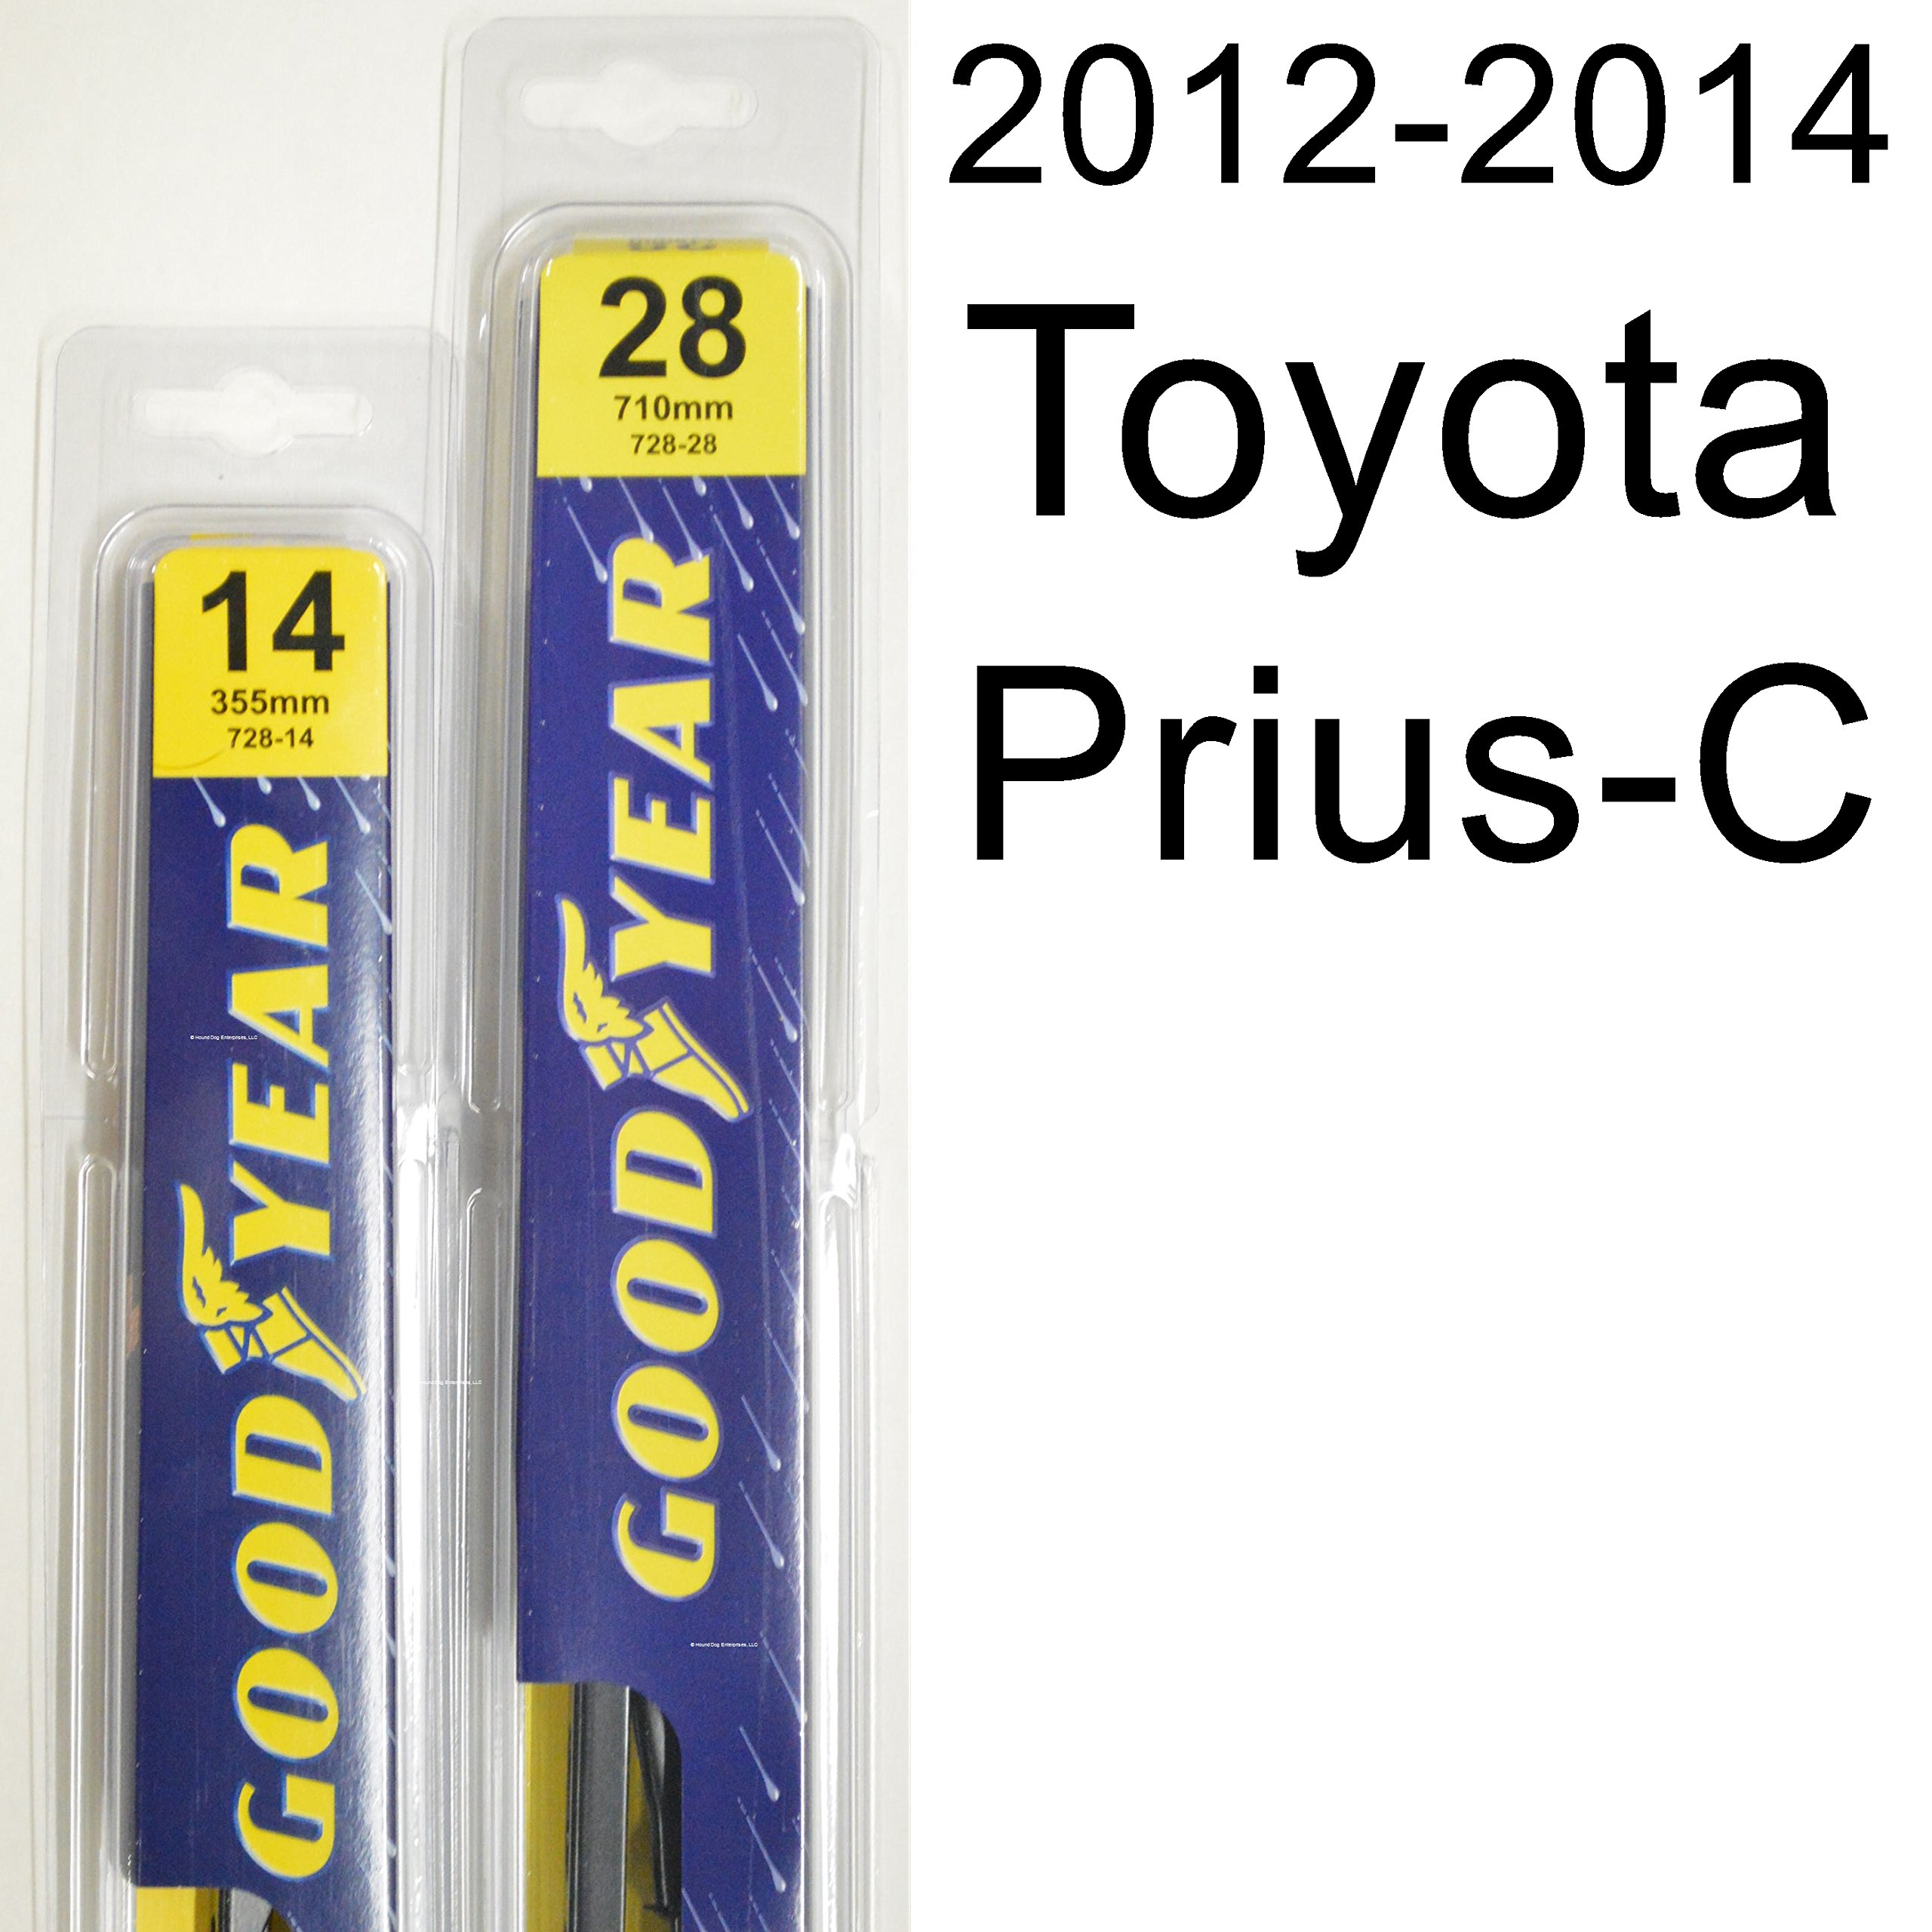 Toyota Prius-C (2012-2014) Wiper Blade Kit - Set Includes 28'' (Driver Side), 14'' (Passenger Side) (2 Blades Total)